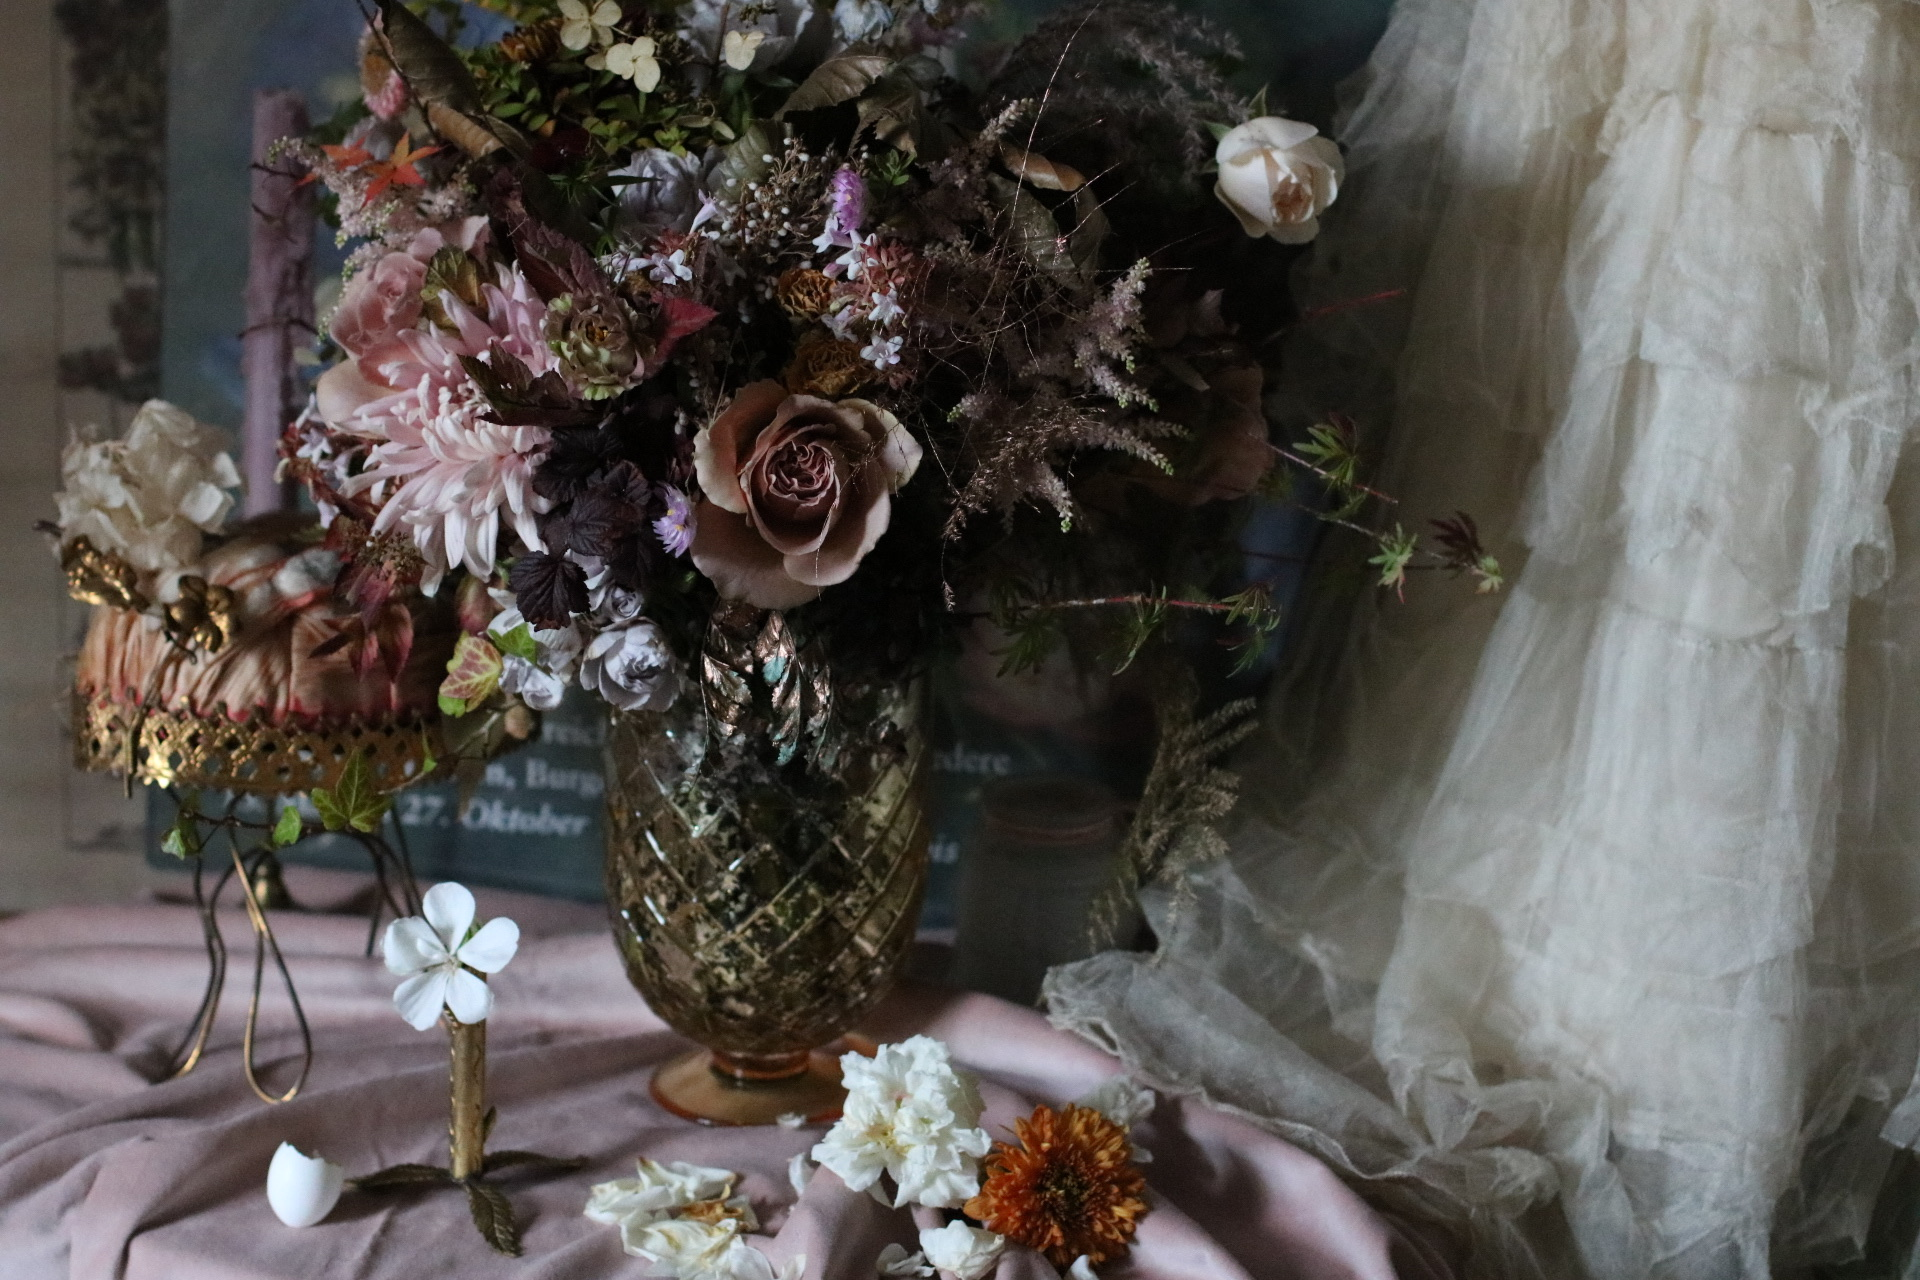 Saint Floral Autumn vintage wedding flowers